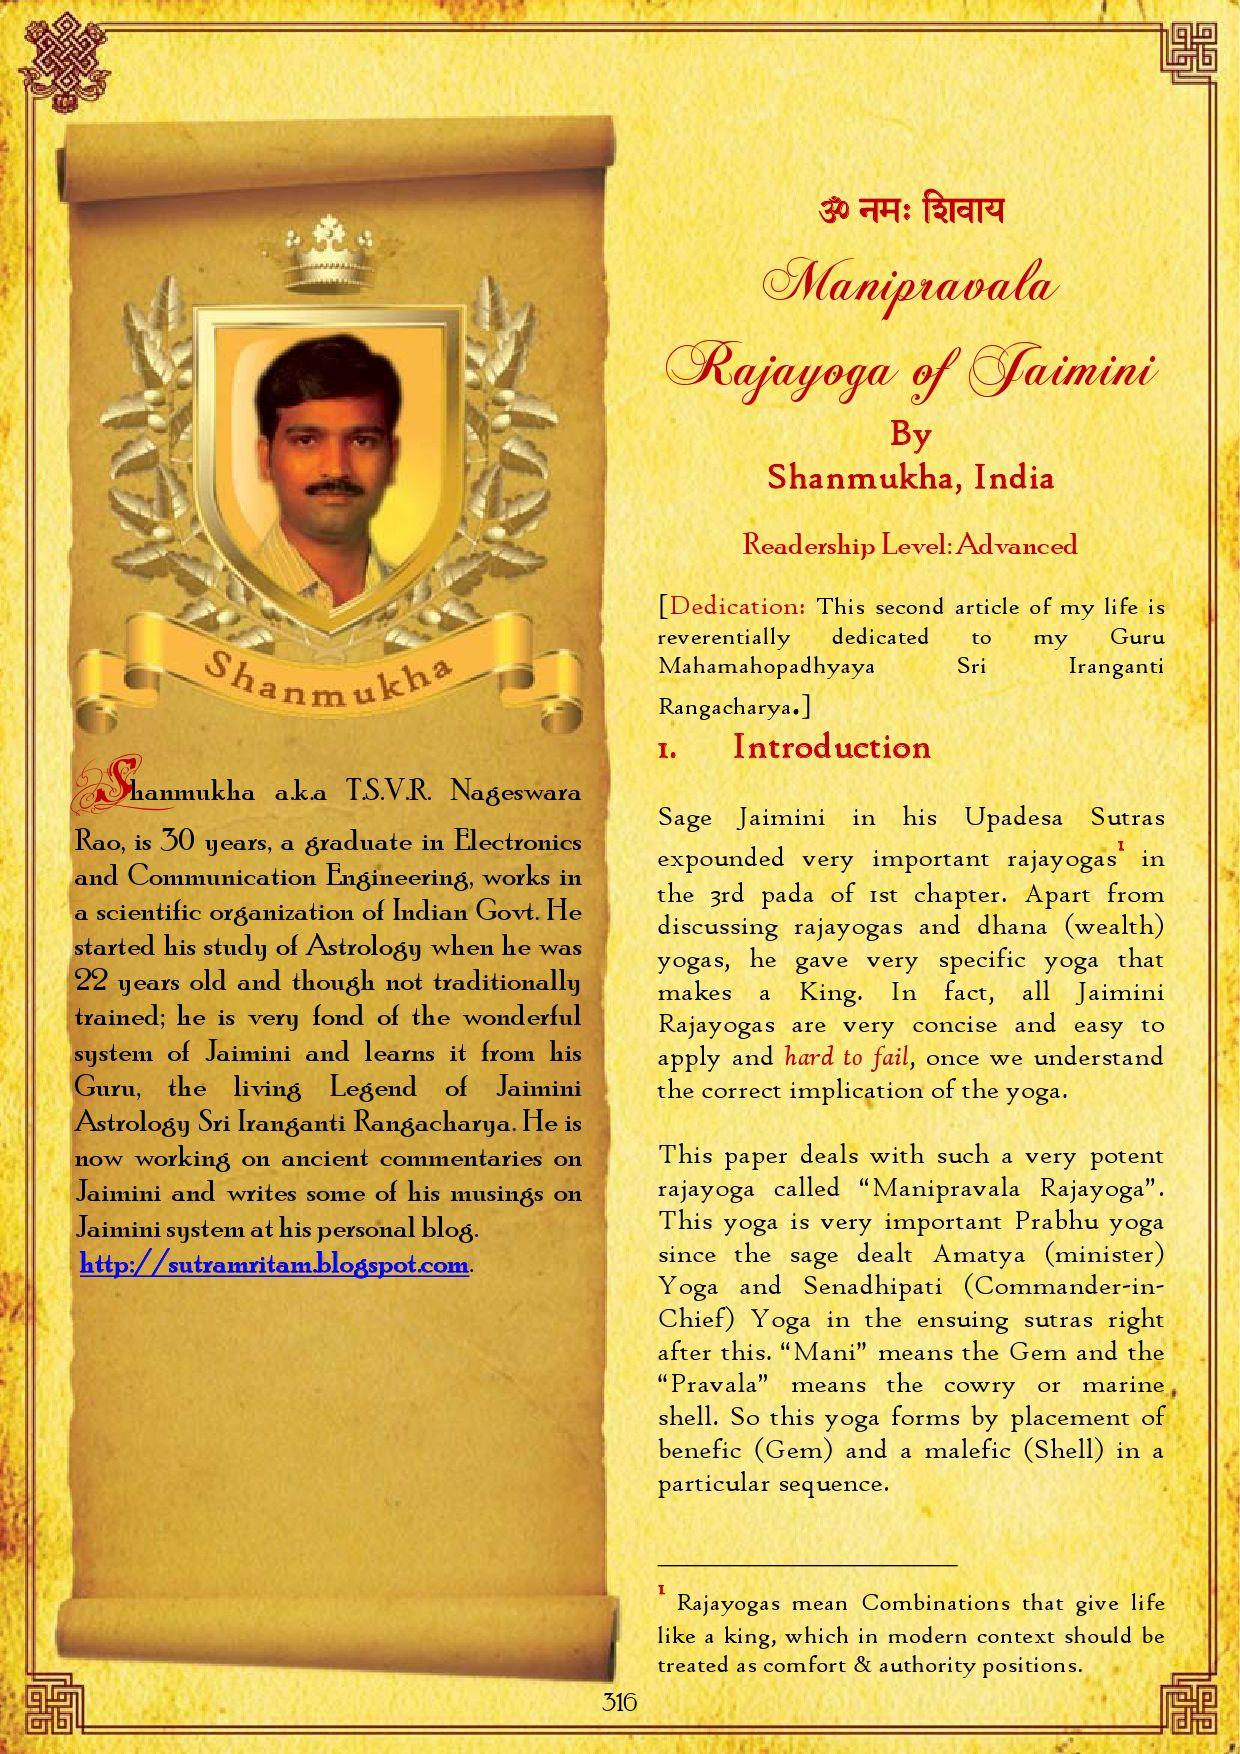 Microsoft Word - 32-Manipravala Rajayoga of Jaimini by